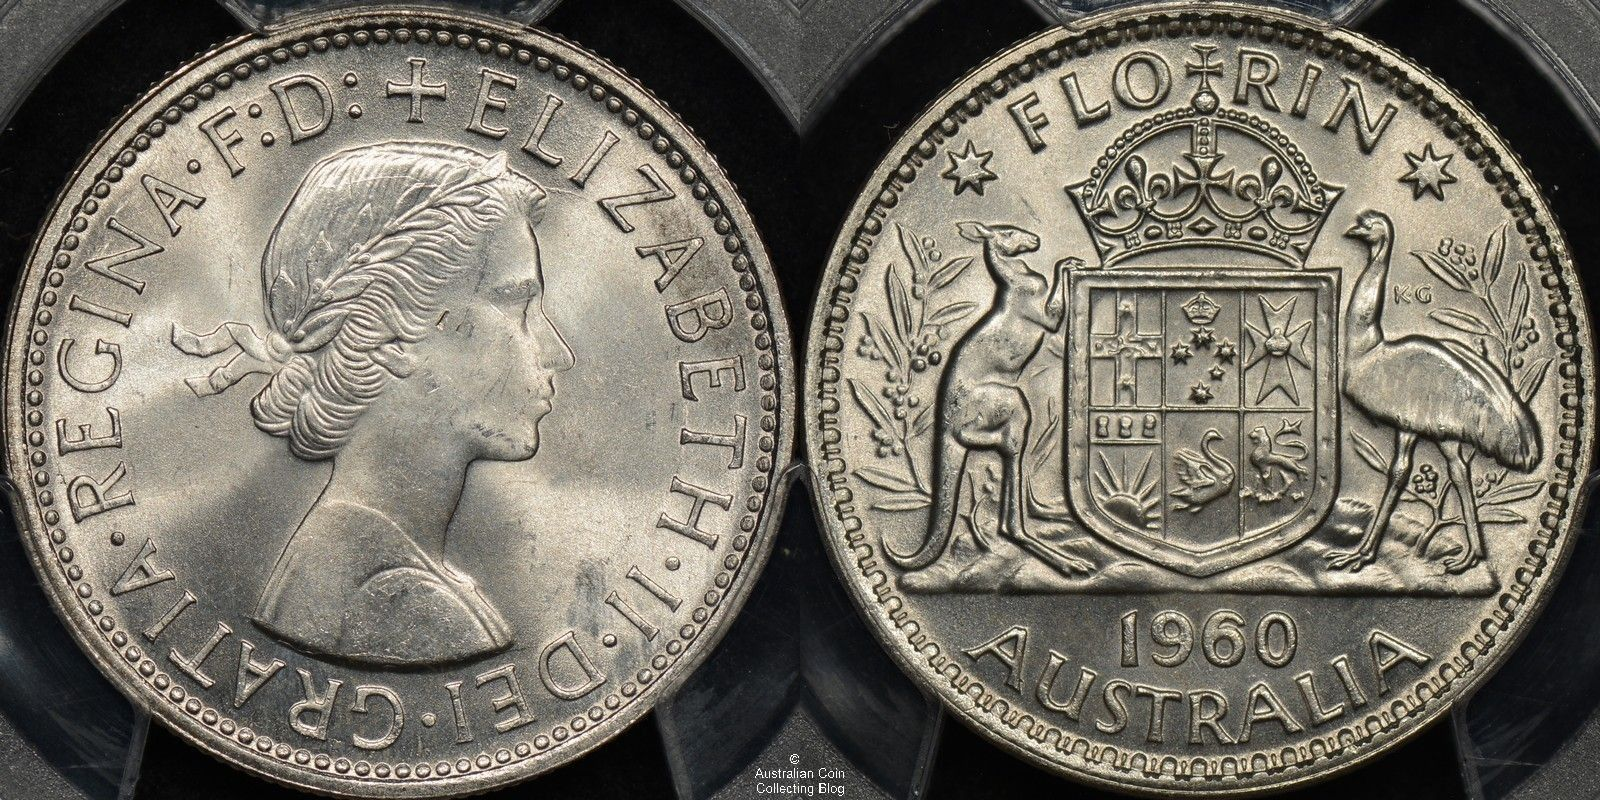 Australia Florin Pcgs Ms64 Coins Australiancoins